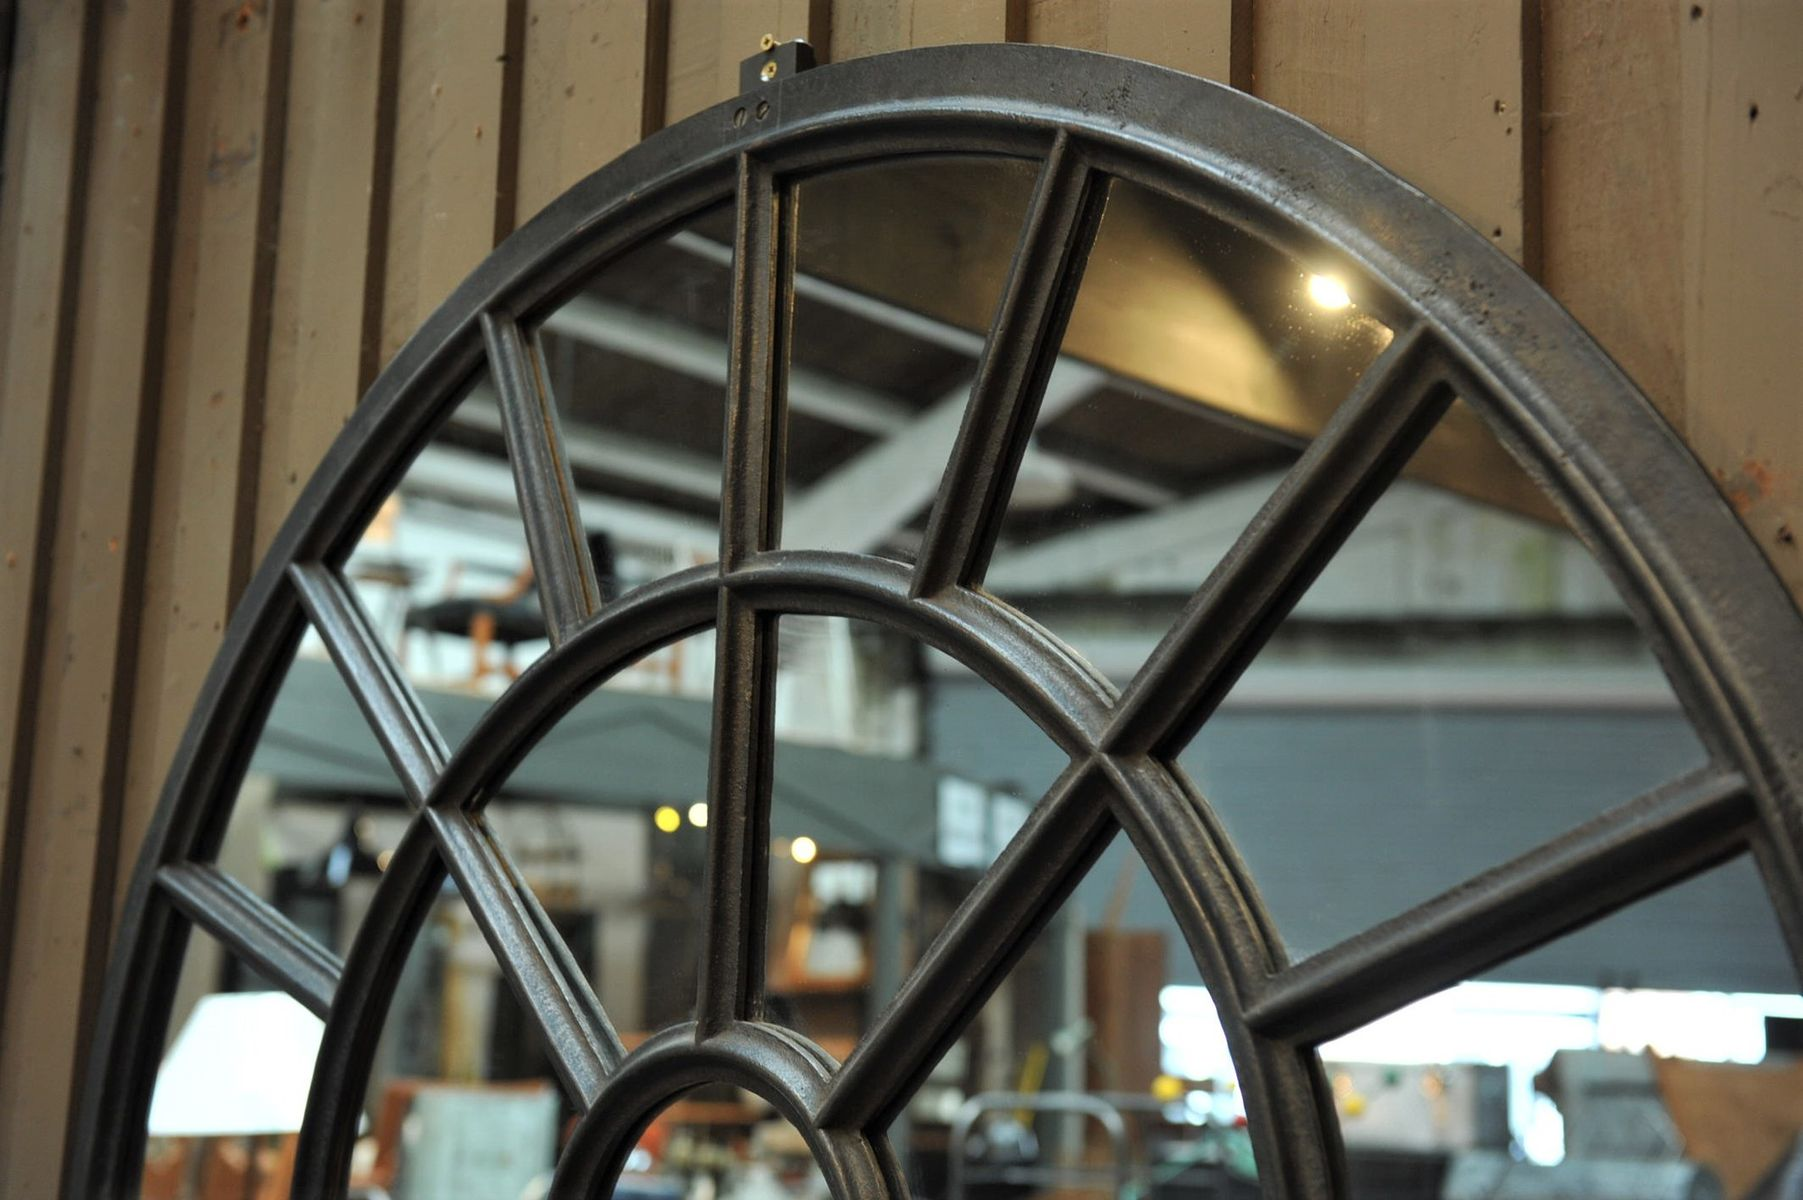 Fabrikfenster Kaufen fabrikfenster kaufen hausdesign pro